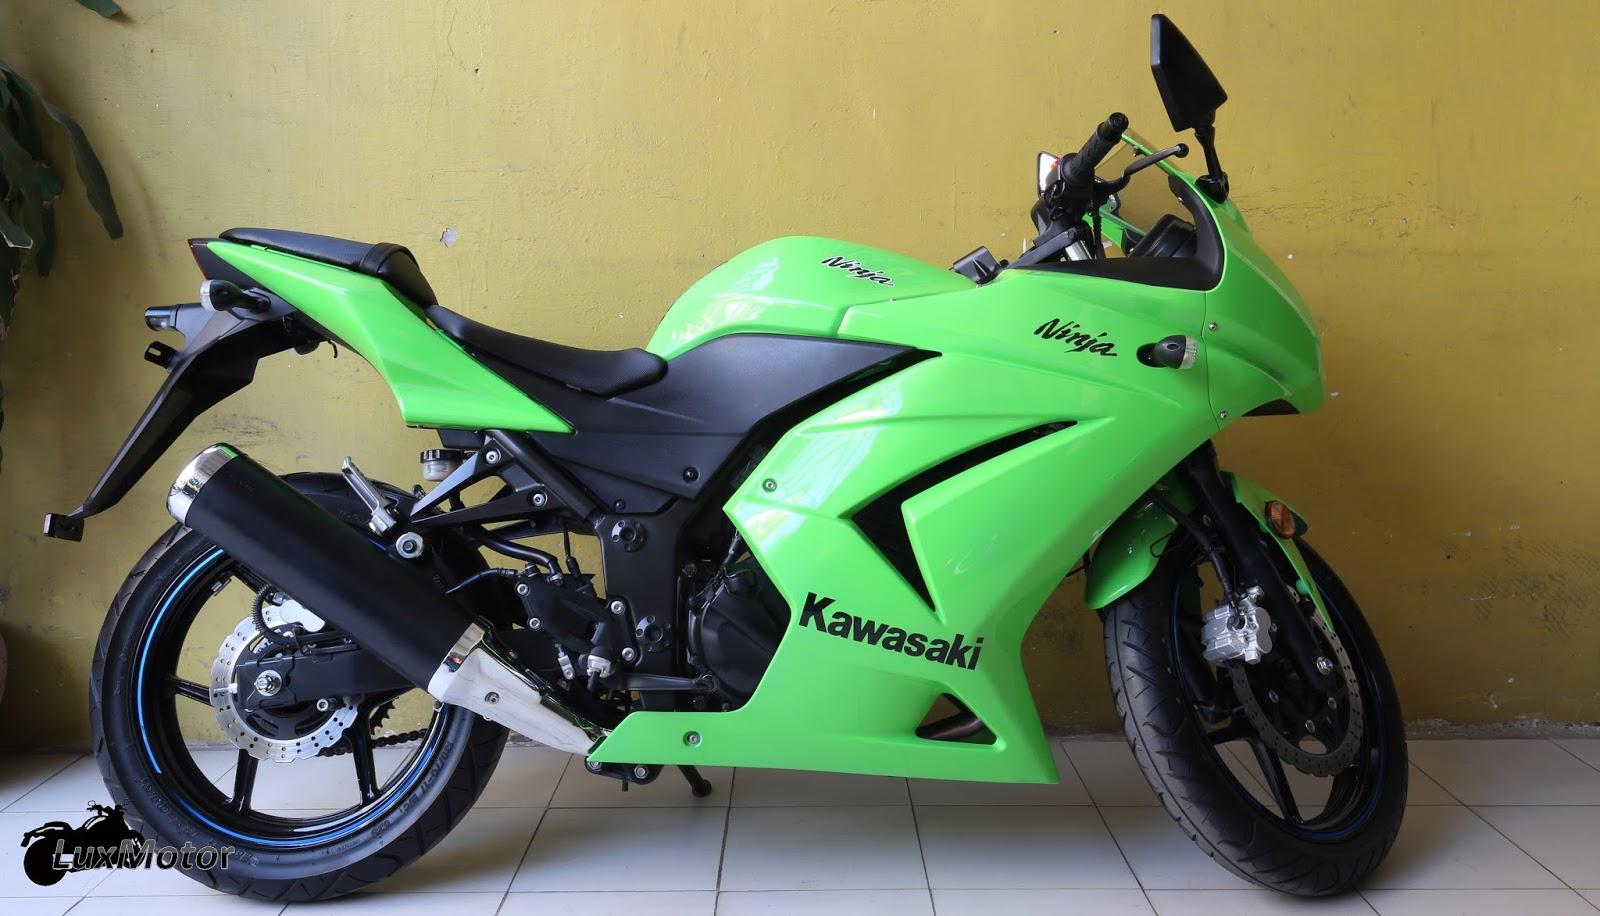 2012 Kawasaki Ninja 250r Cambodia Expats Online Forum News